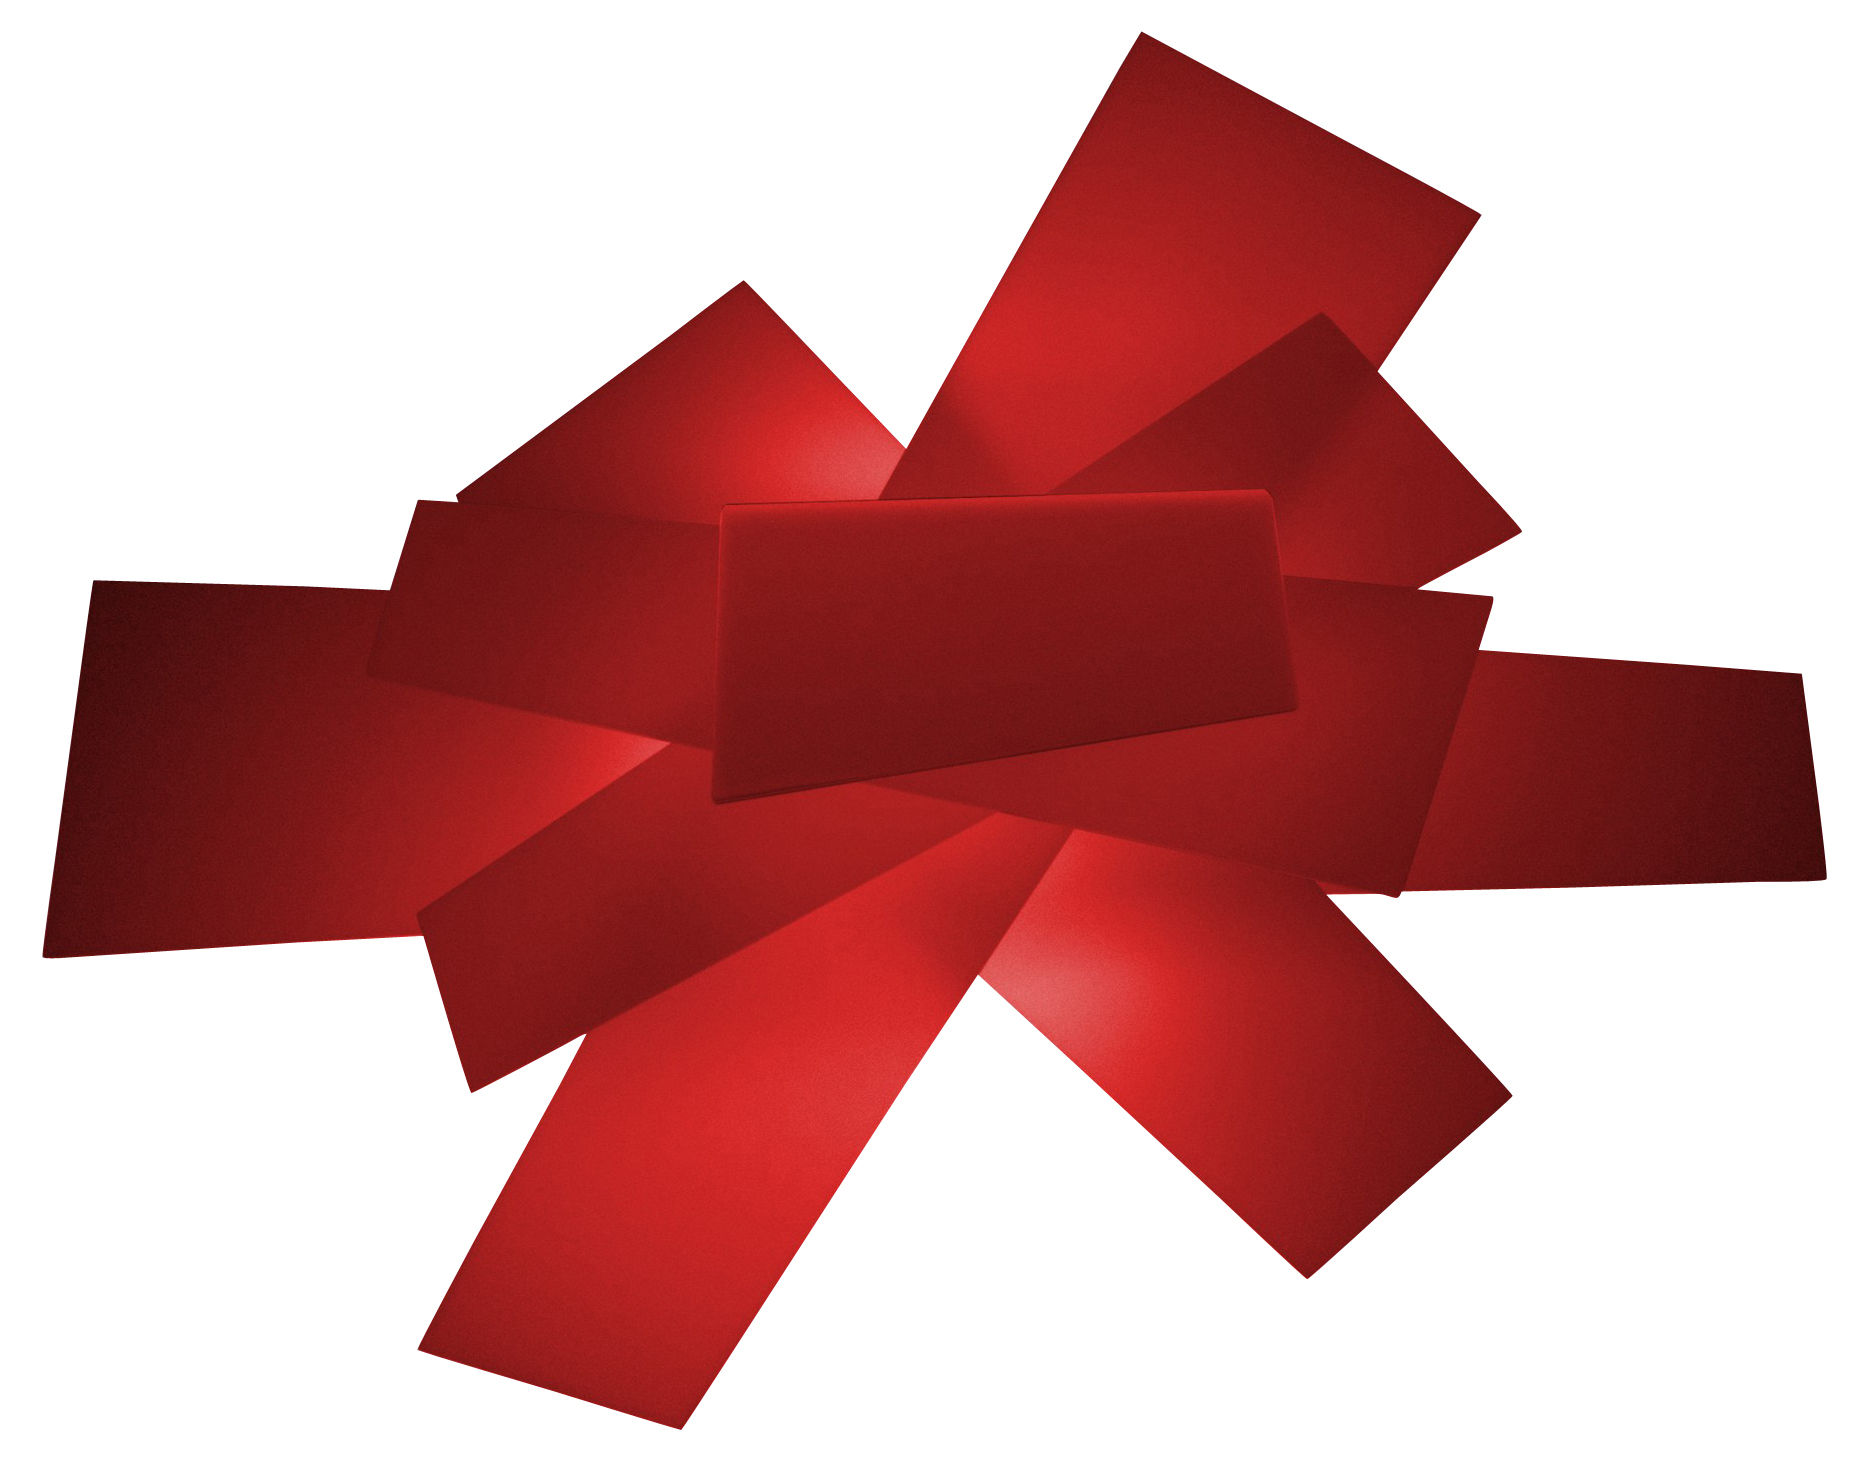 Lighting - Wall Lights - Big Bang Wall light - Ceiling light by Foscarini - Red & white - Methacrylate